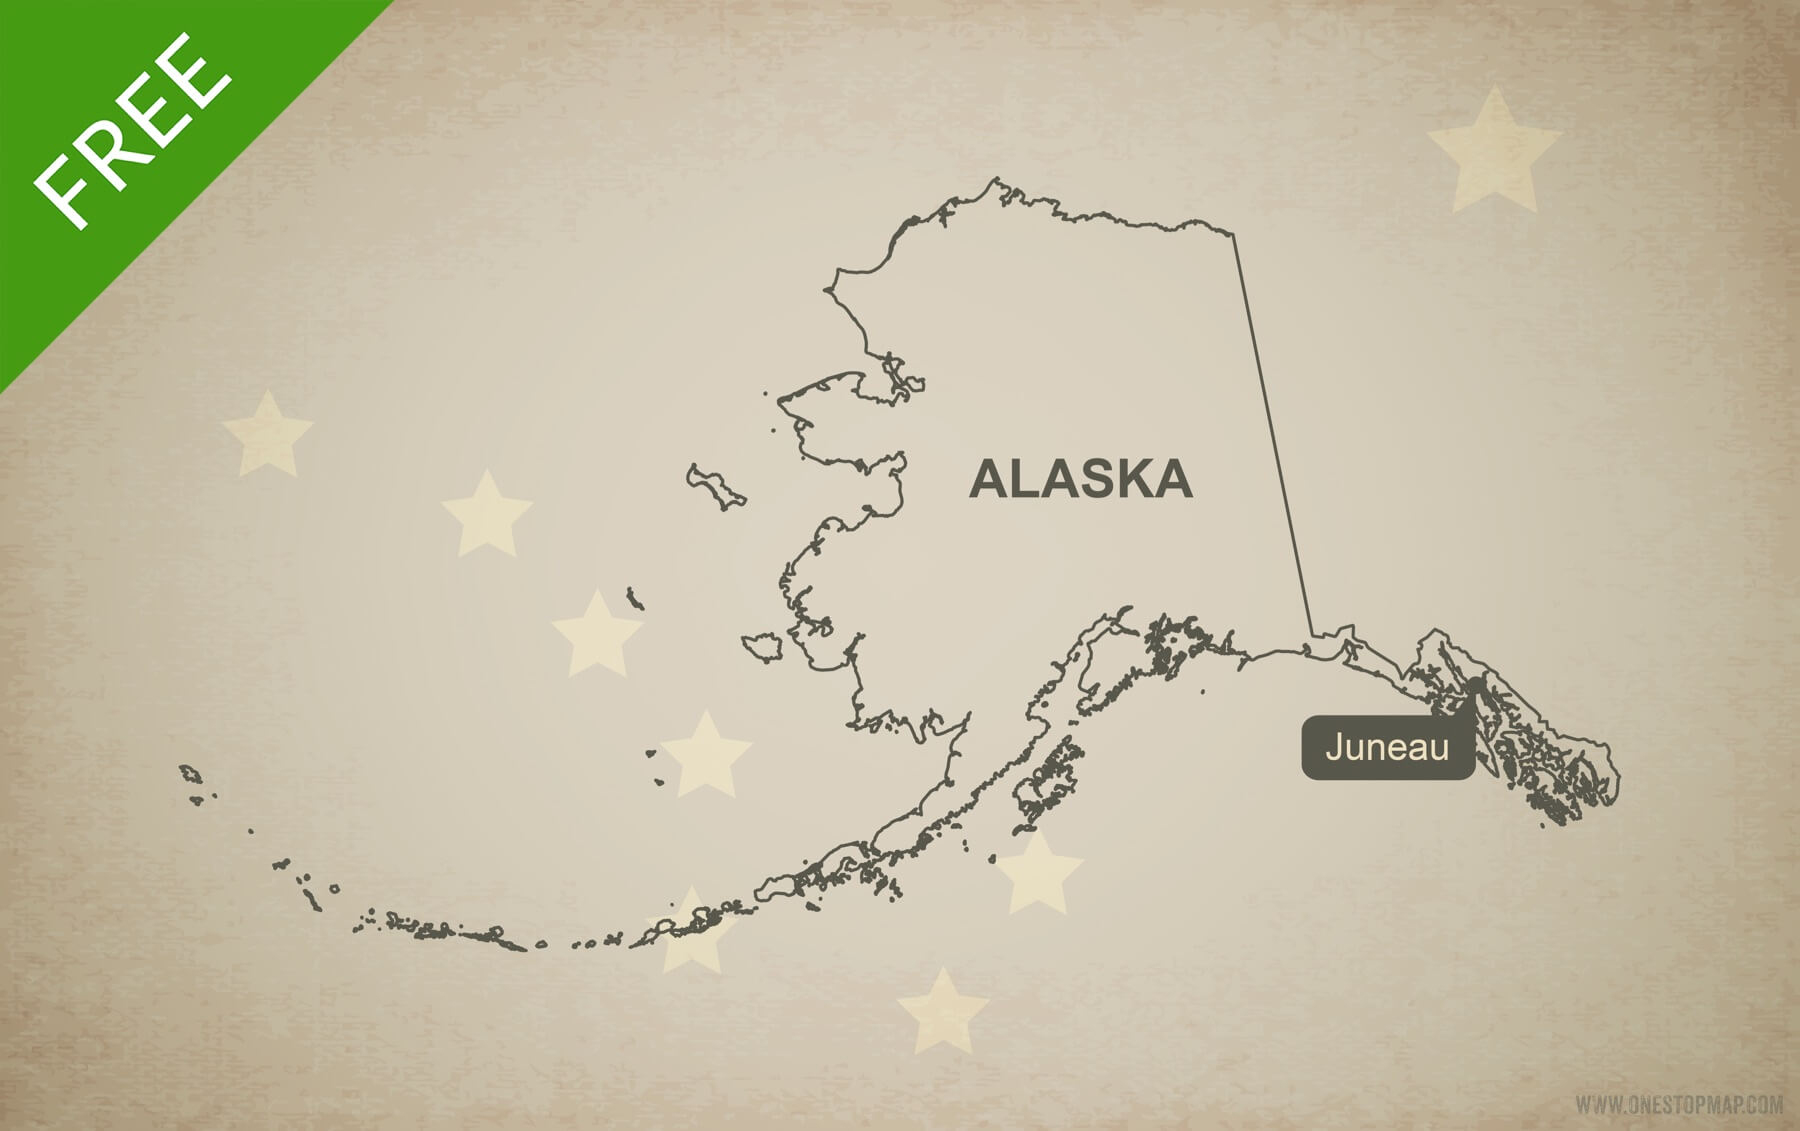 Free Vector Map Of Alaska Outline   One Stop Map - Free Printable Map Of Alaska